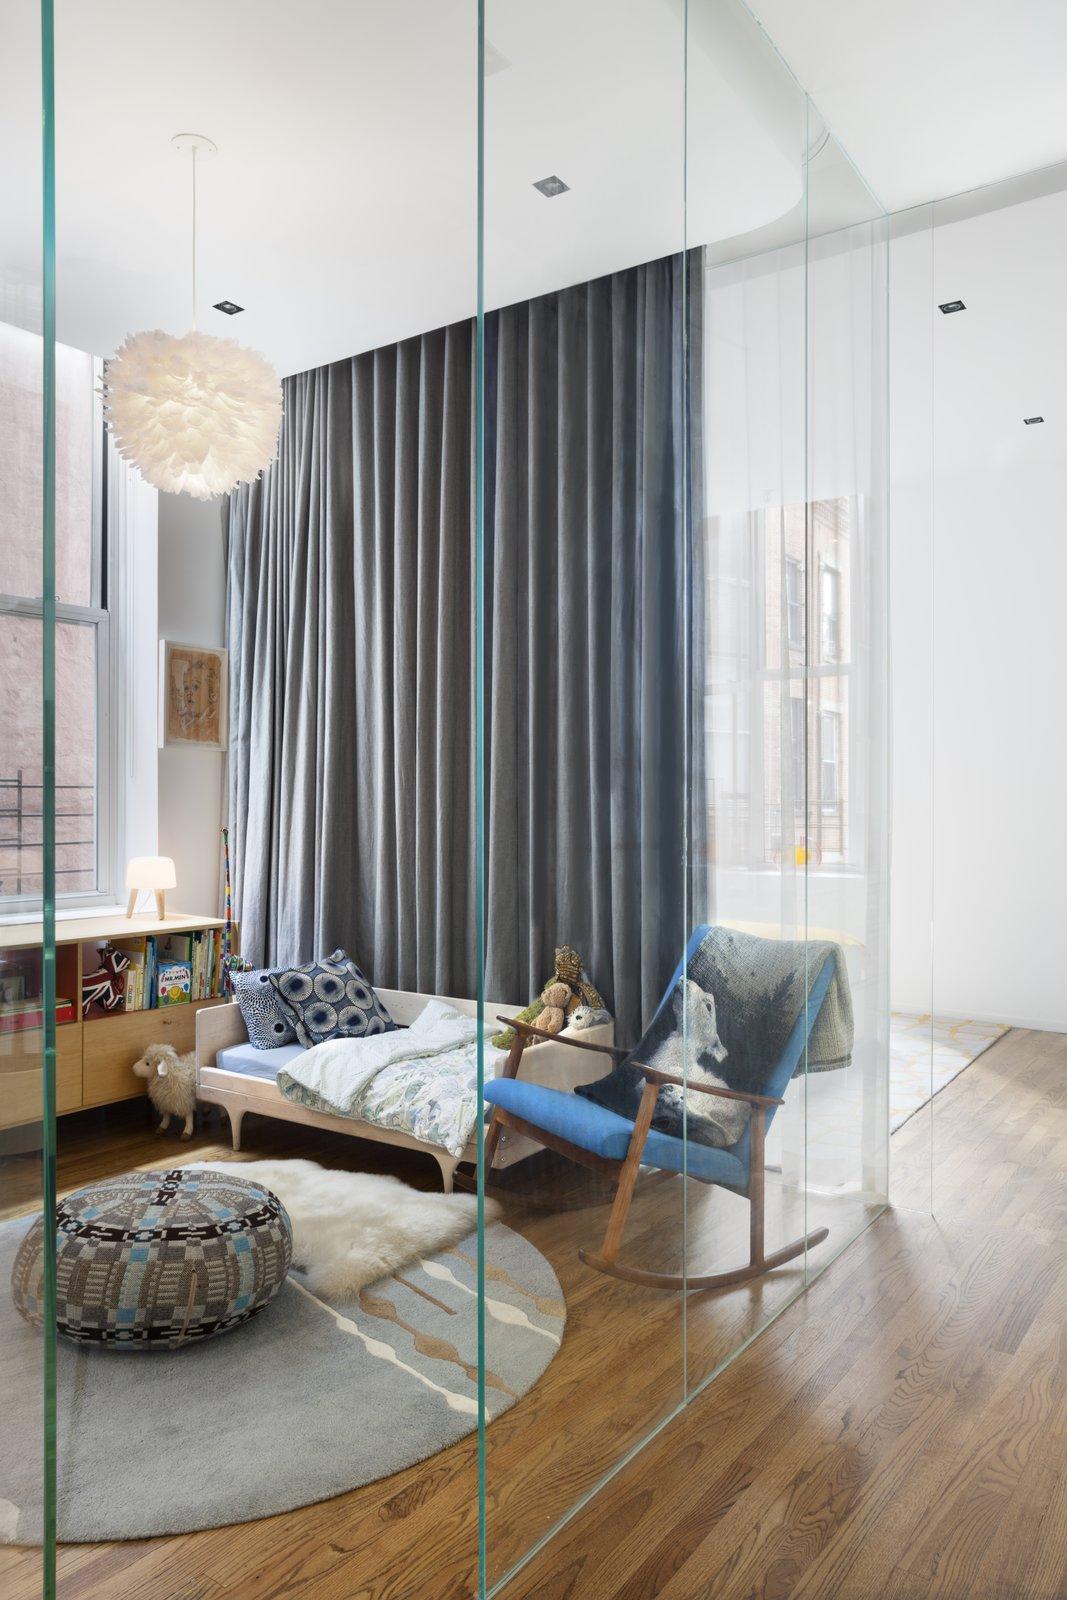 Tribeca Loft by Method Design Architecture and Urbanism children's room